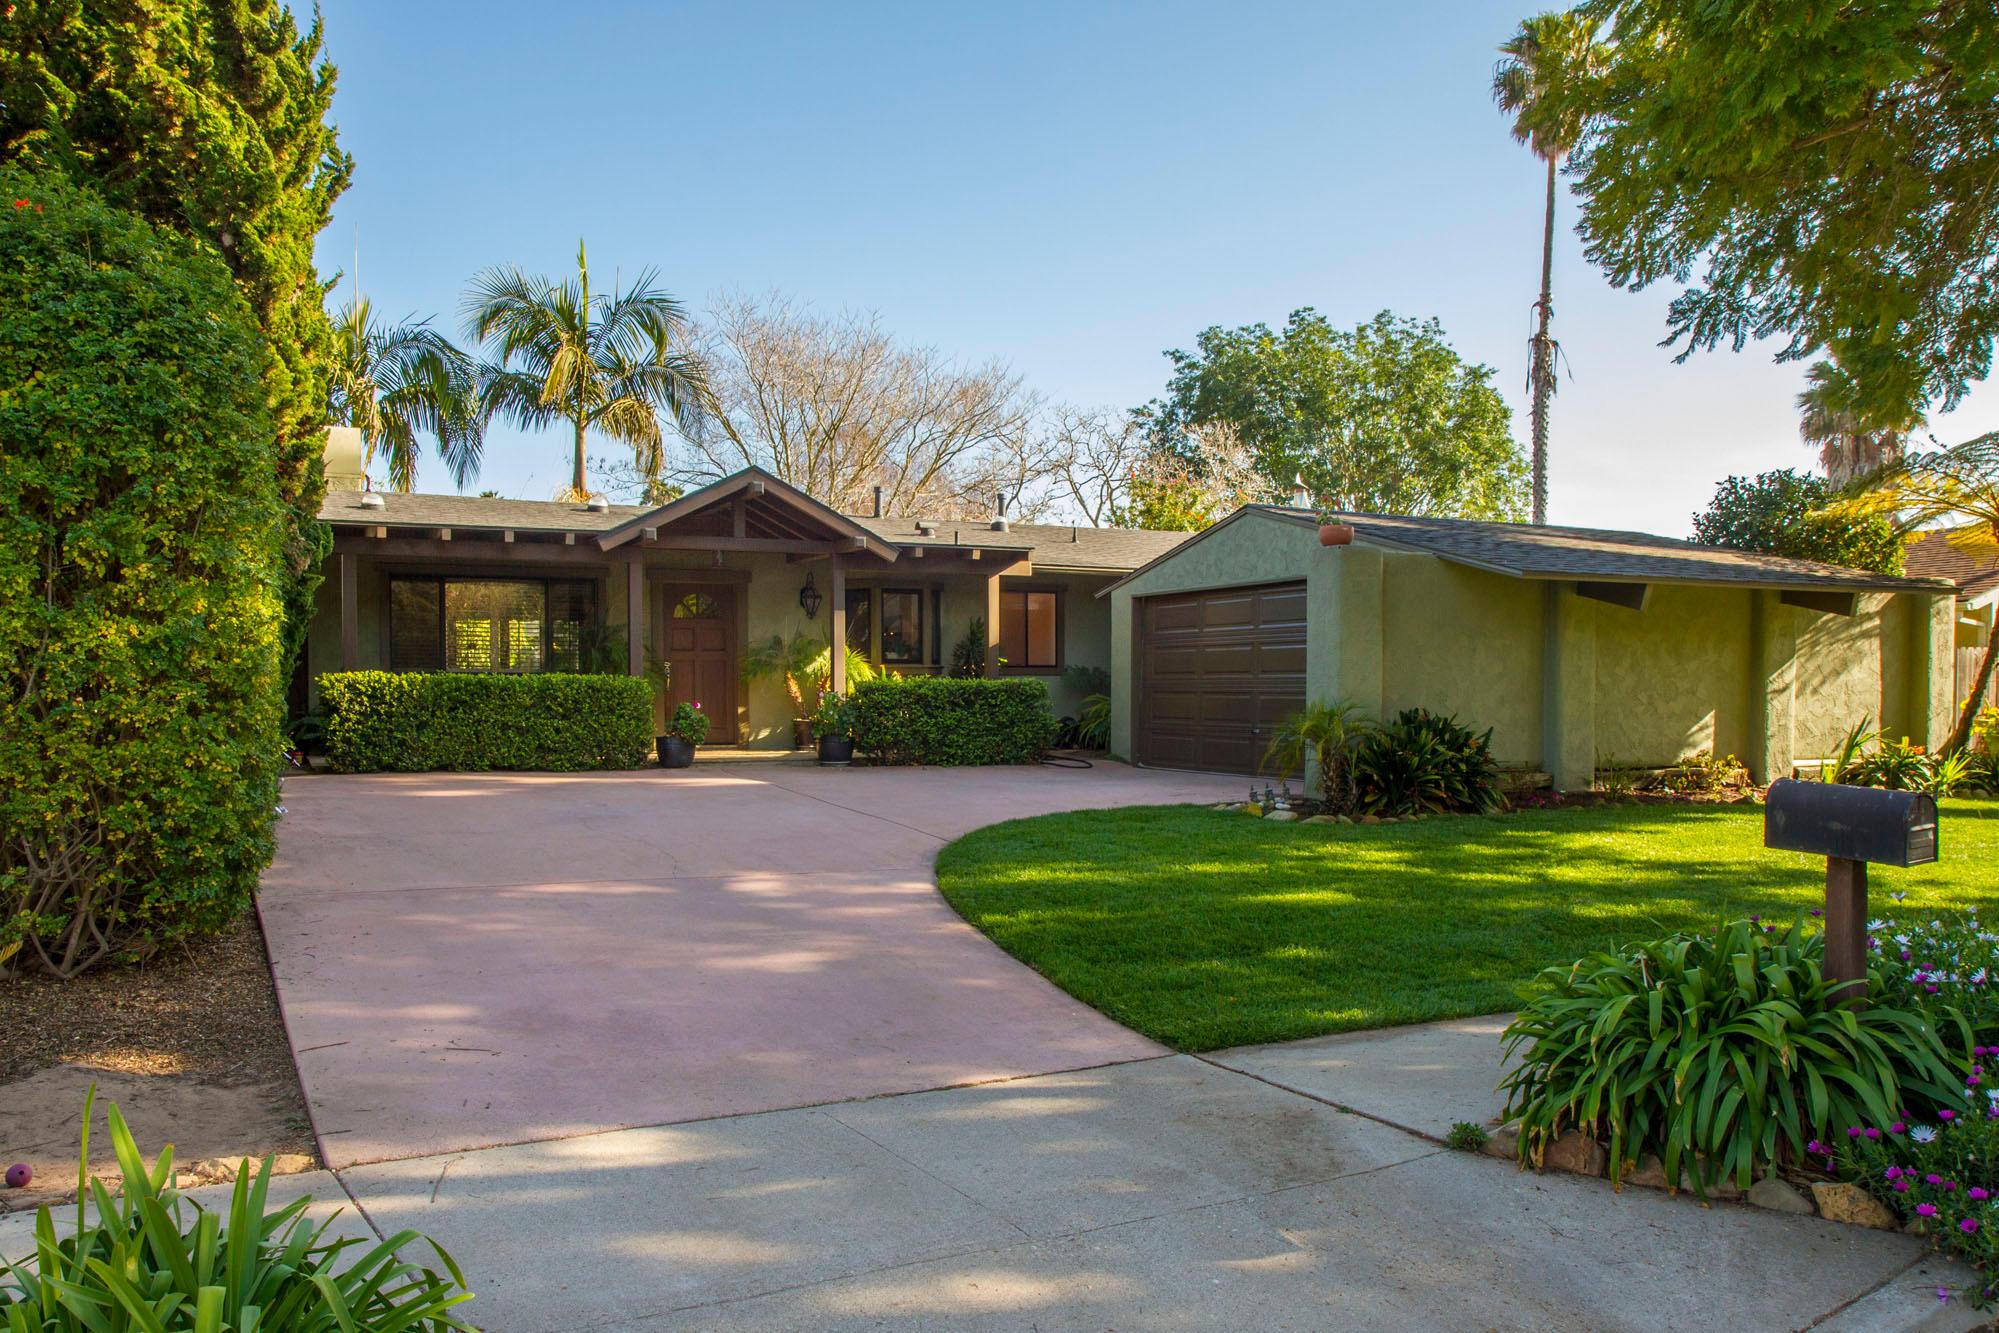 Property photo for 7962 Rio Vista Dr Goleta, California 93117 - 14-583